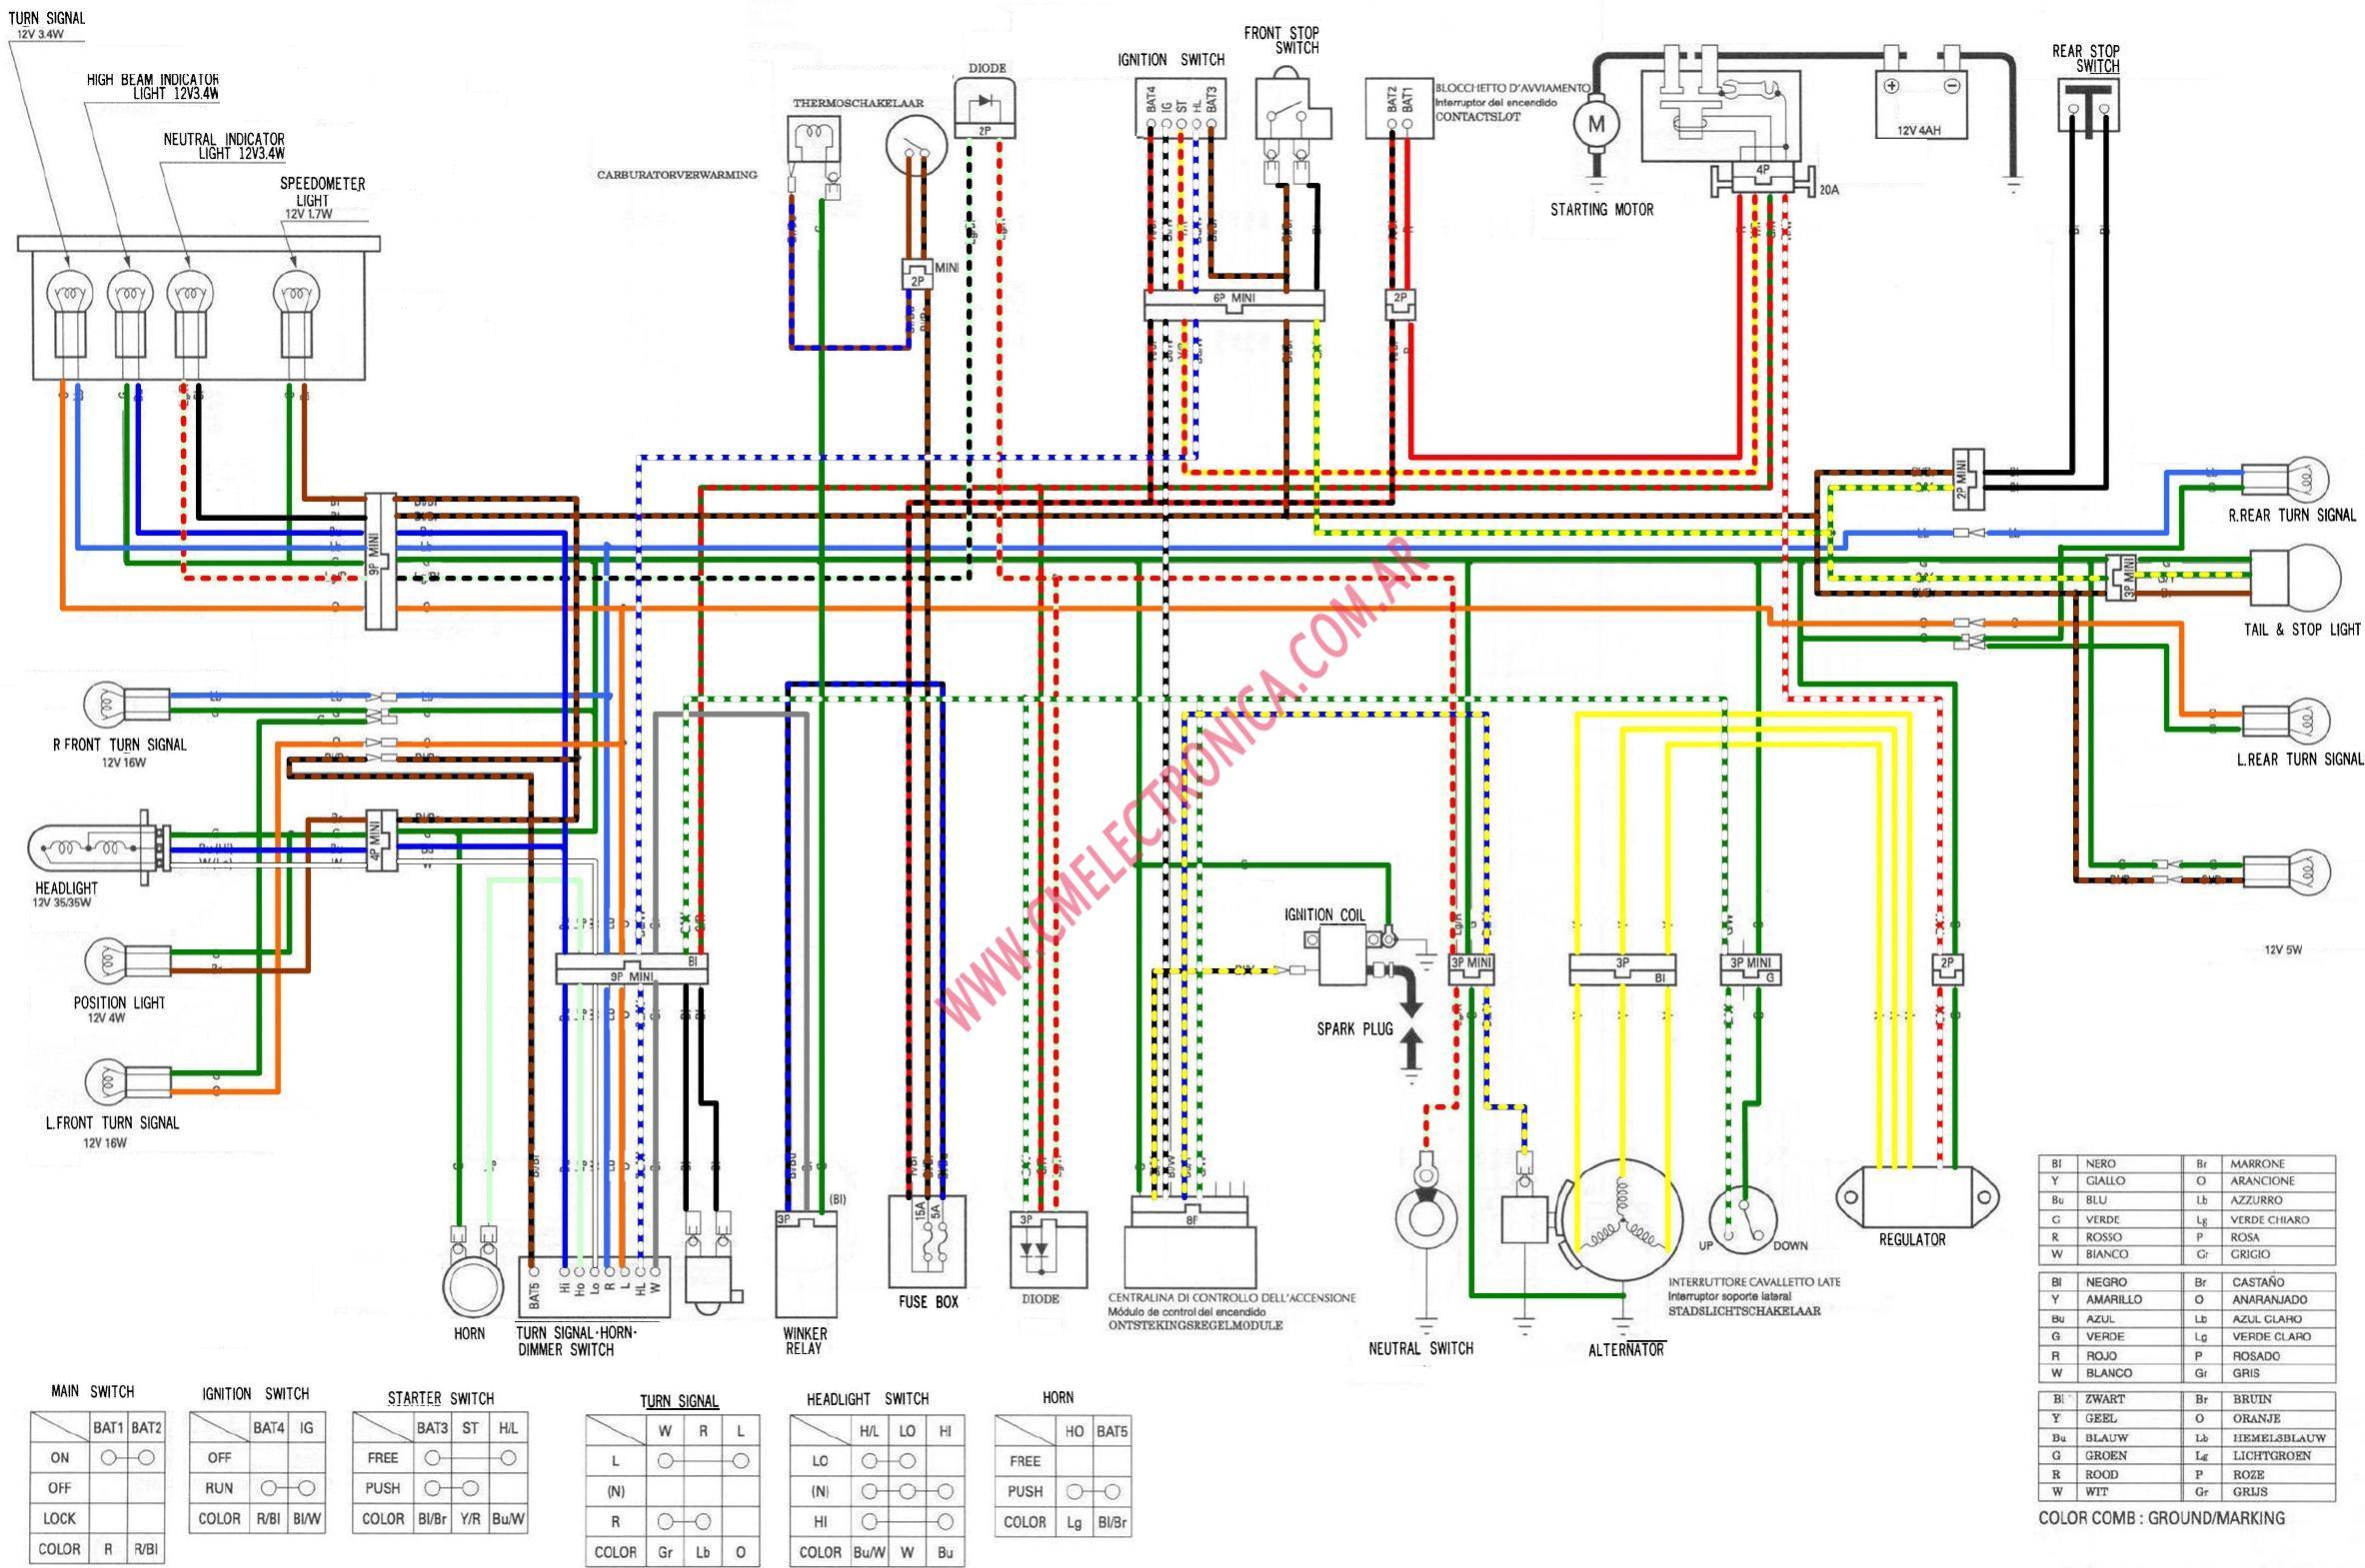 lx torana wiring diagram ns 3281  uc 400 wiring diagram  ns 3281  uc 400 wiring diagram